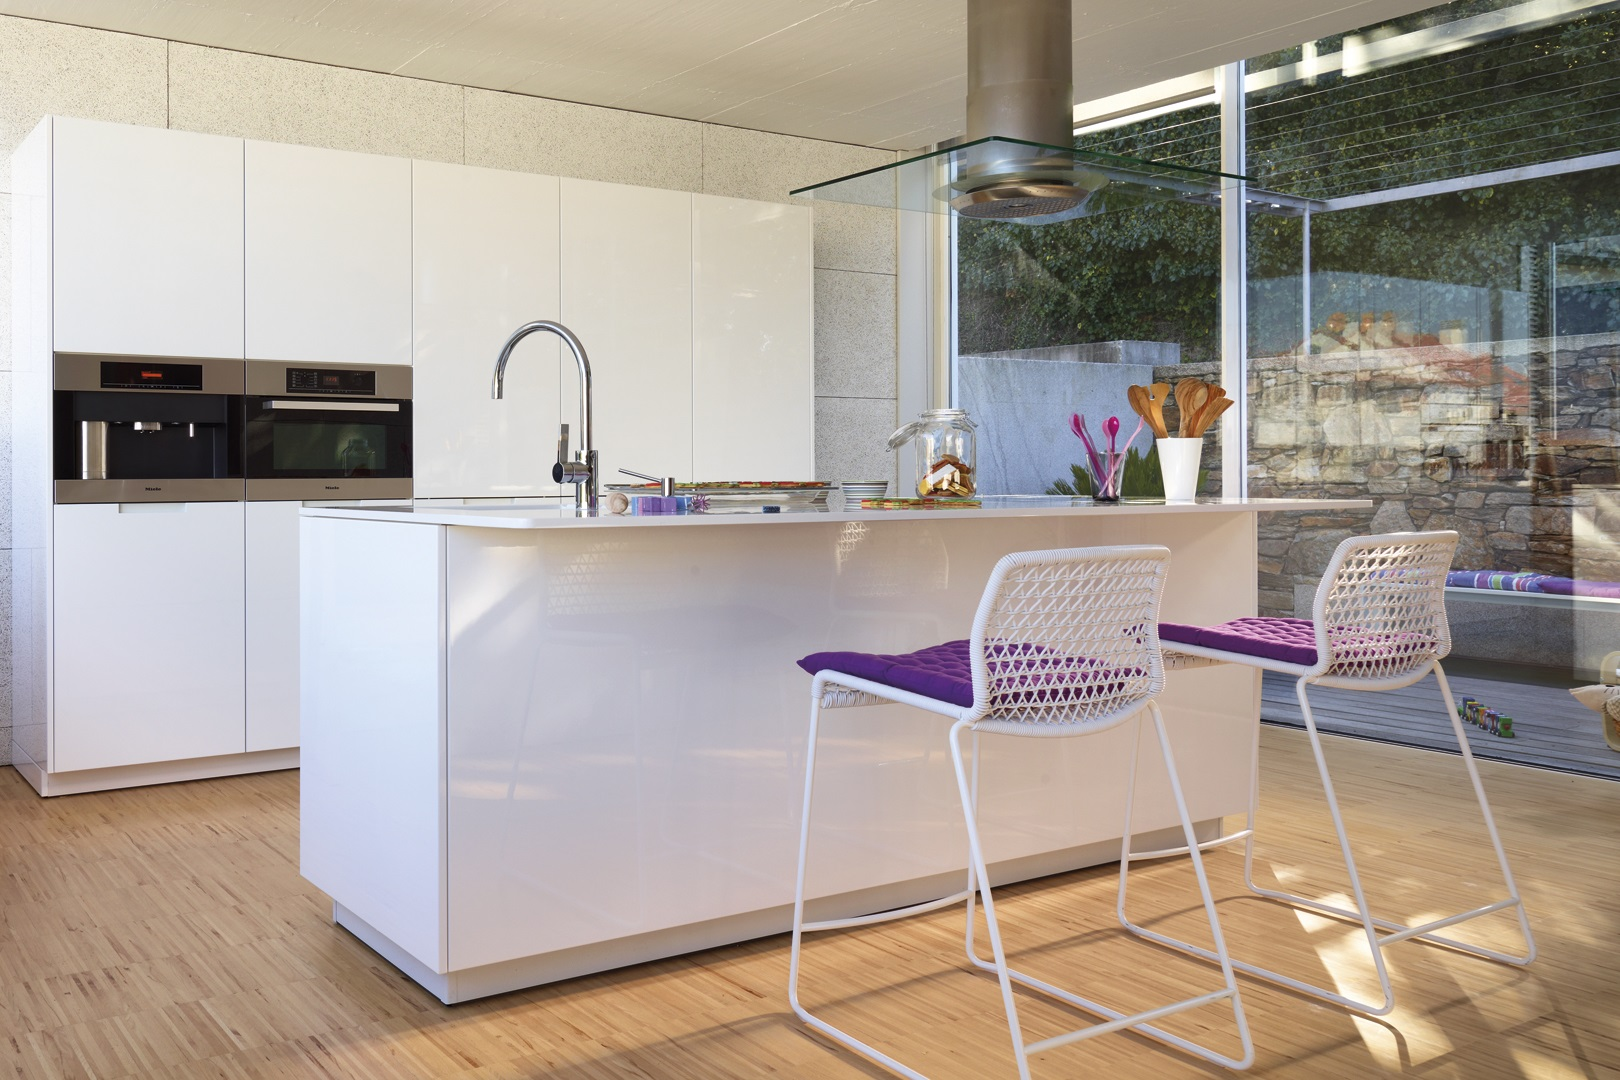 14 Ideas De Cocinas Blancas Para Inspirarte Santiago Interiores - Cocinas-blancas-con-isla